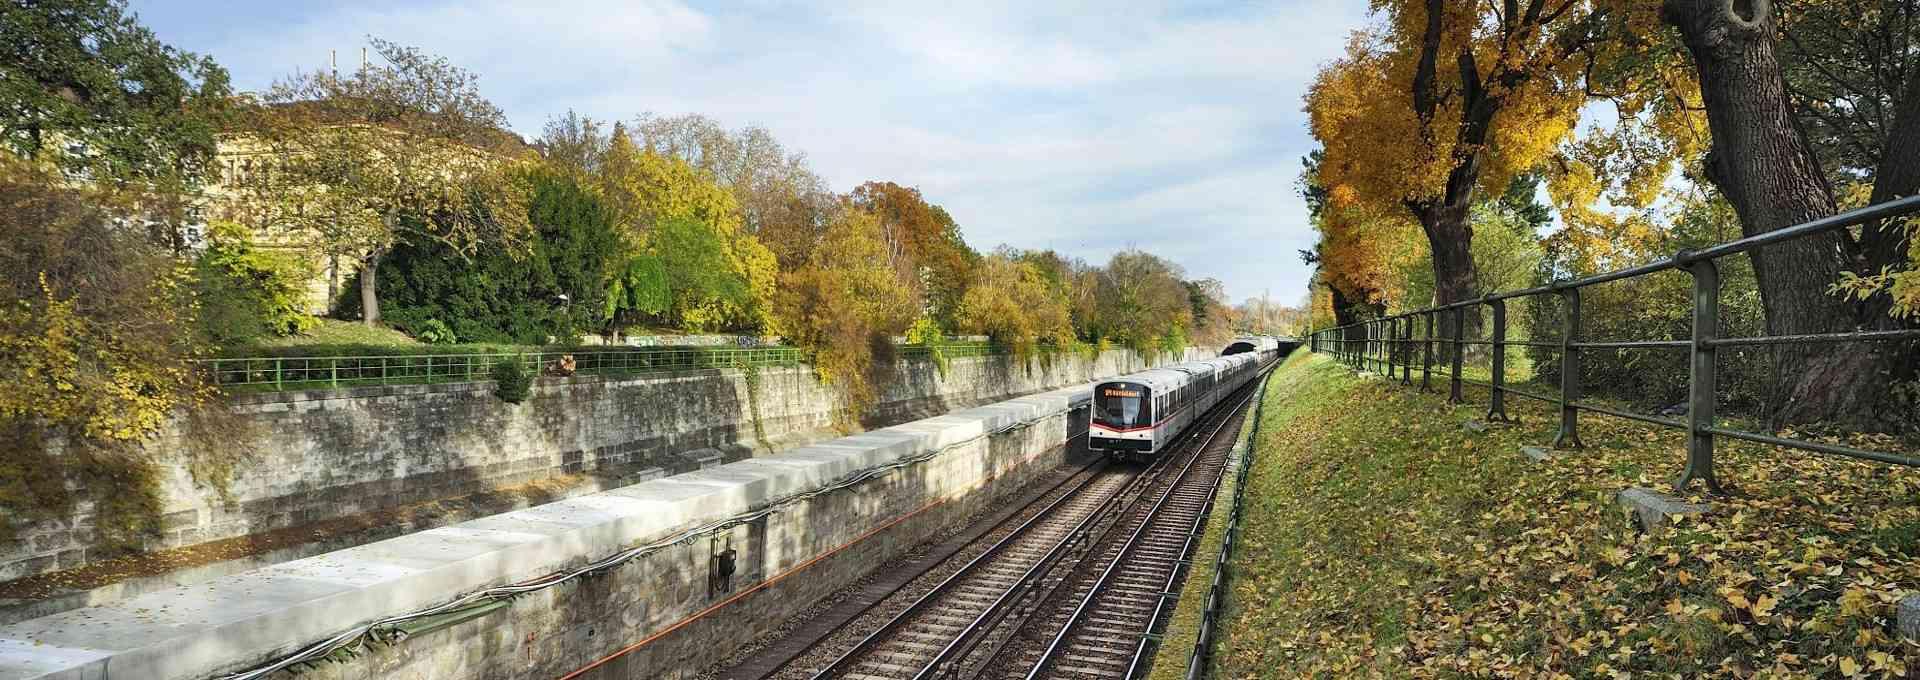 Die U4 befördert jährlich 86 Millionen Fahrgäsate auf insgesamt 20 Stationen.